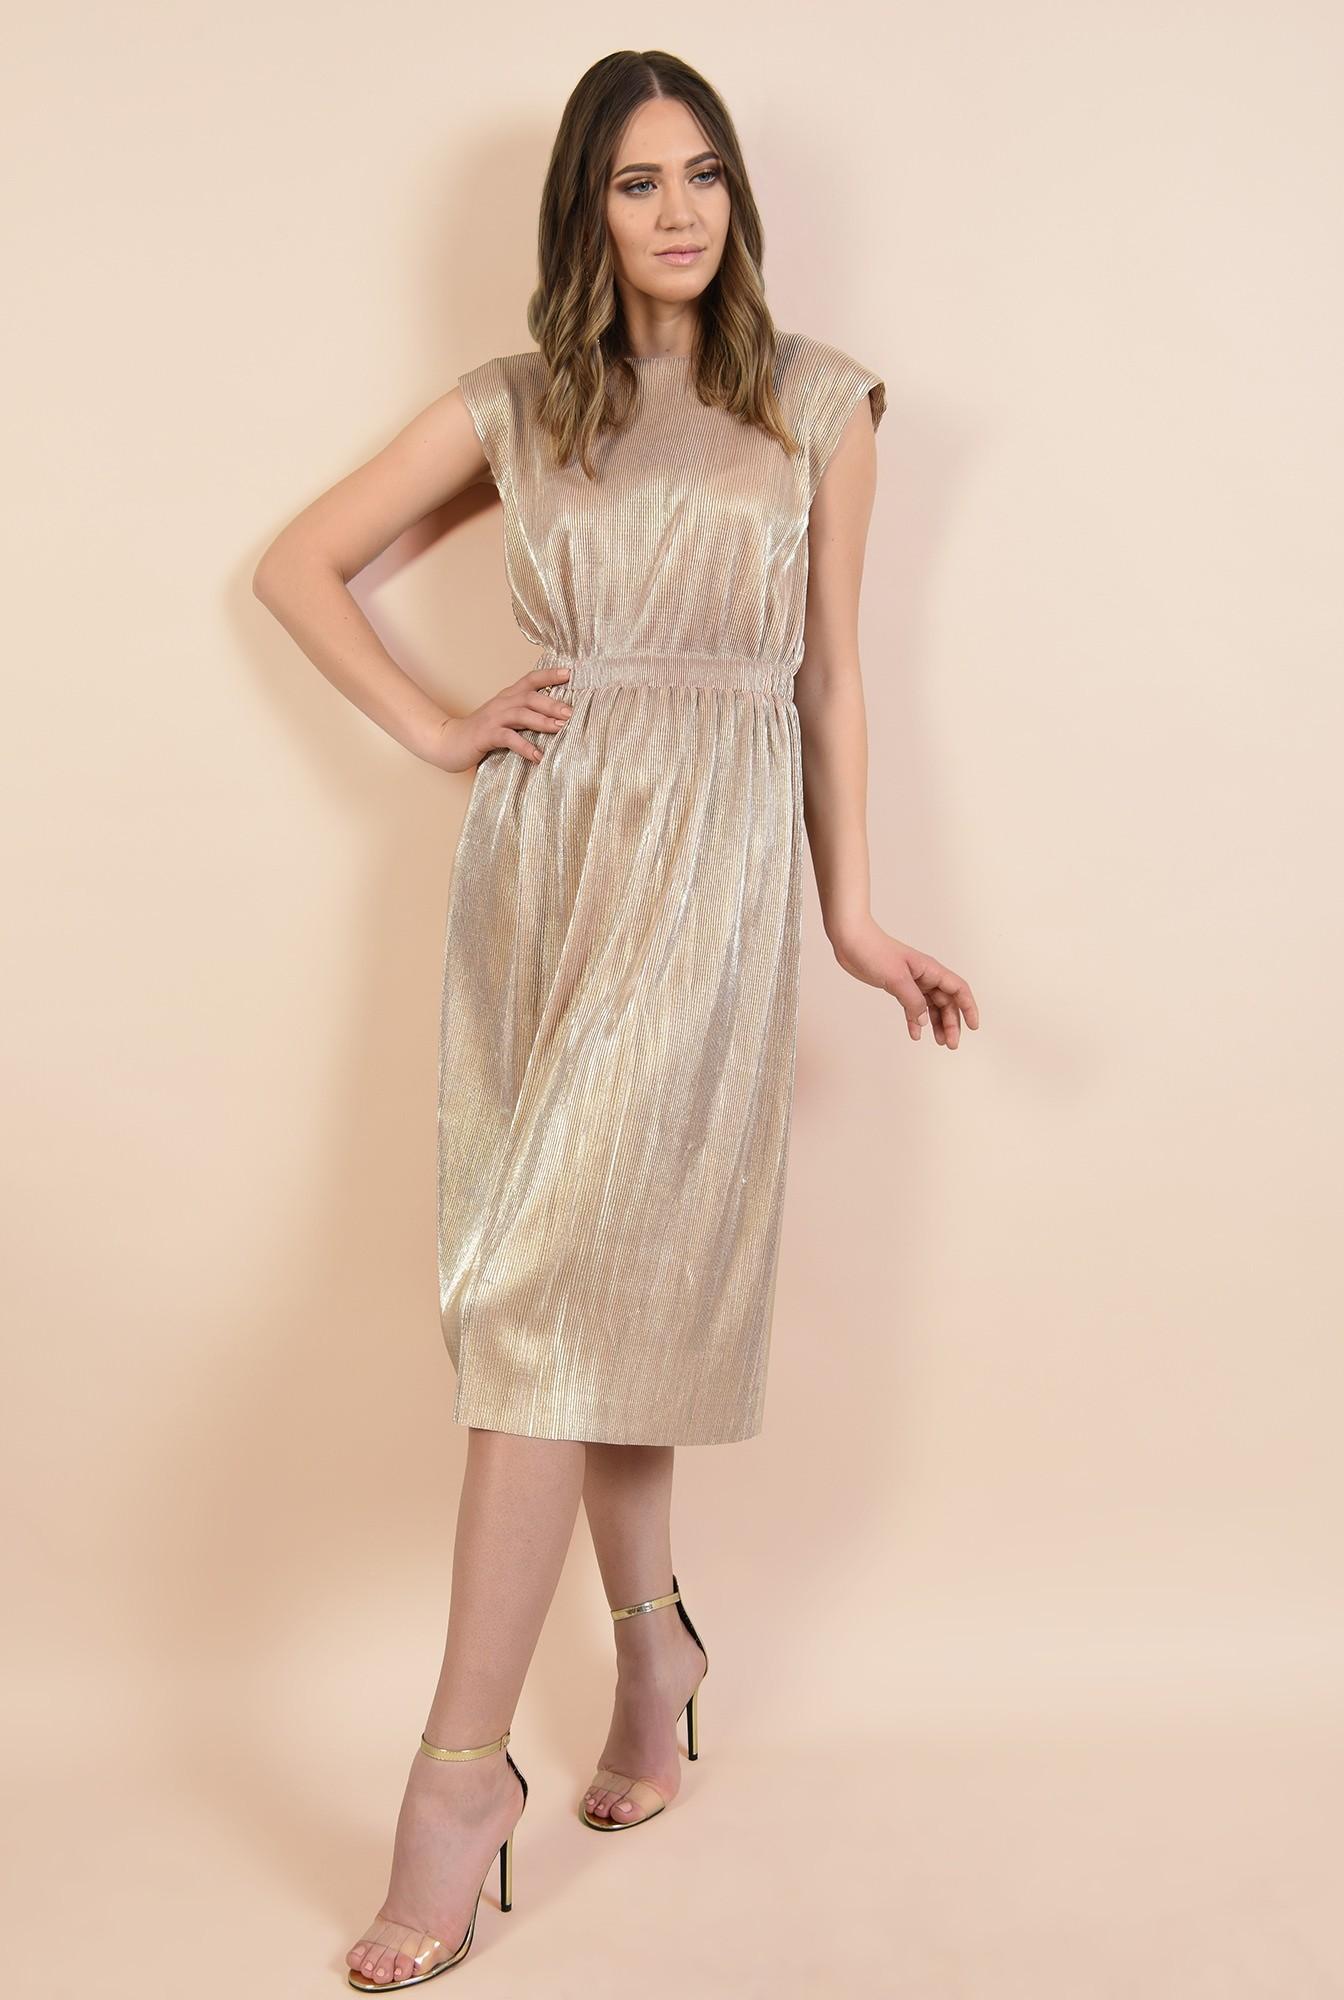 3 - rochie de seara, lungime midi, croi evazat, cambrata, talie pe elastic